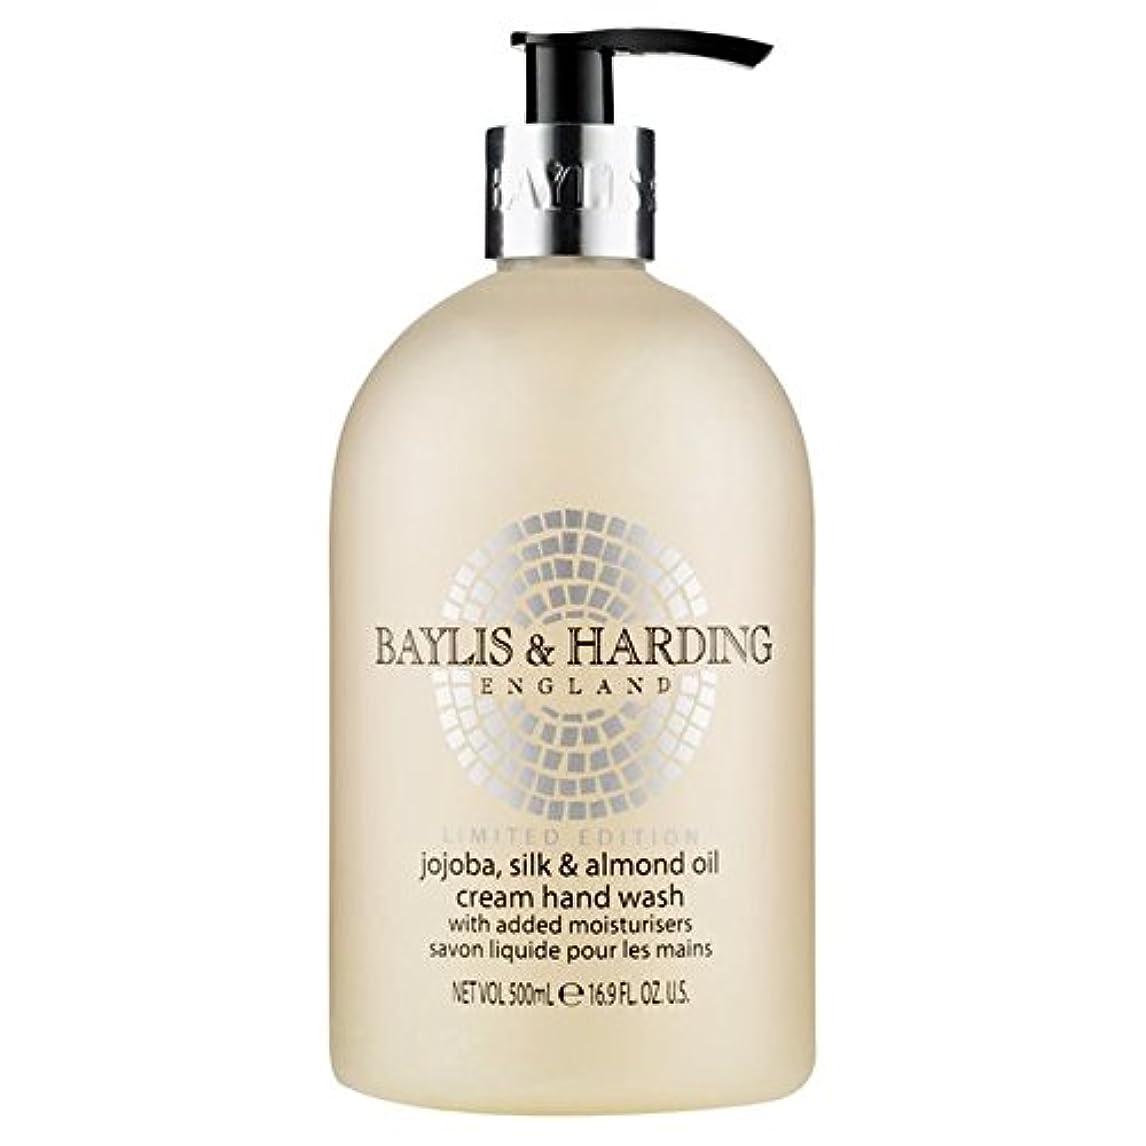 Baylis & Harding Jojoba, Silk & Almond Oil Hand Wash 500ml (Pack of 6) - ベイリス&ハーディングホホバ、シルク&アーモンドオイルハンドウォッシュ500ミリリットル x6 [並行輸入品]